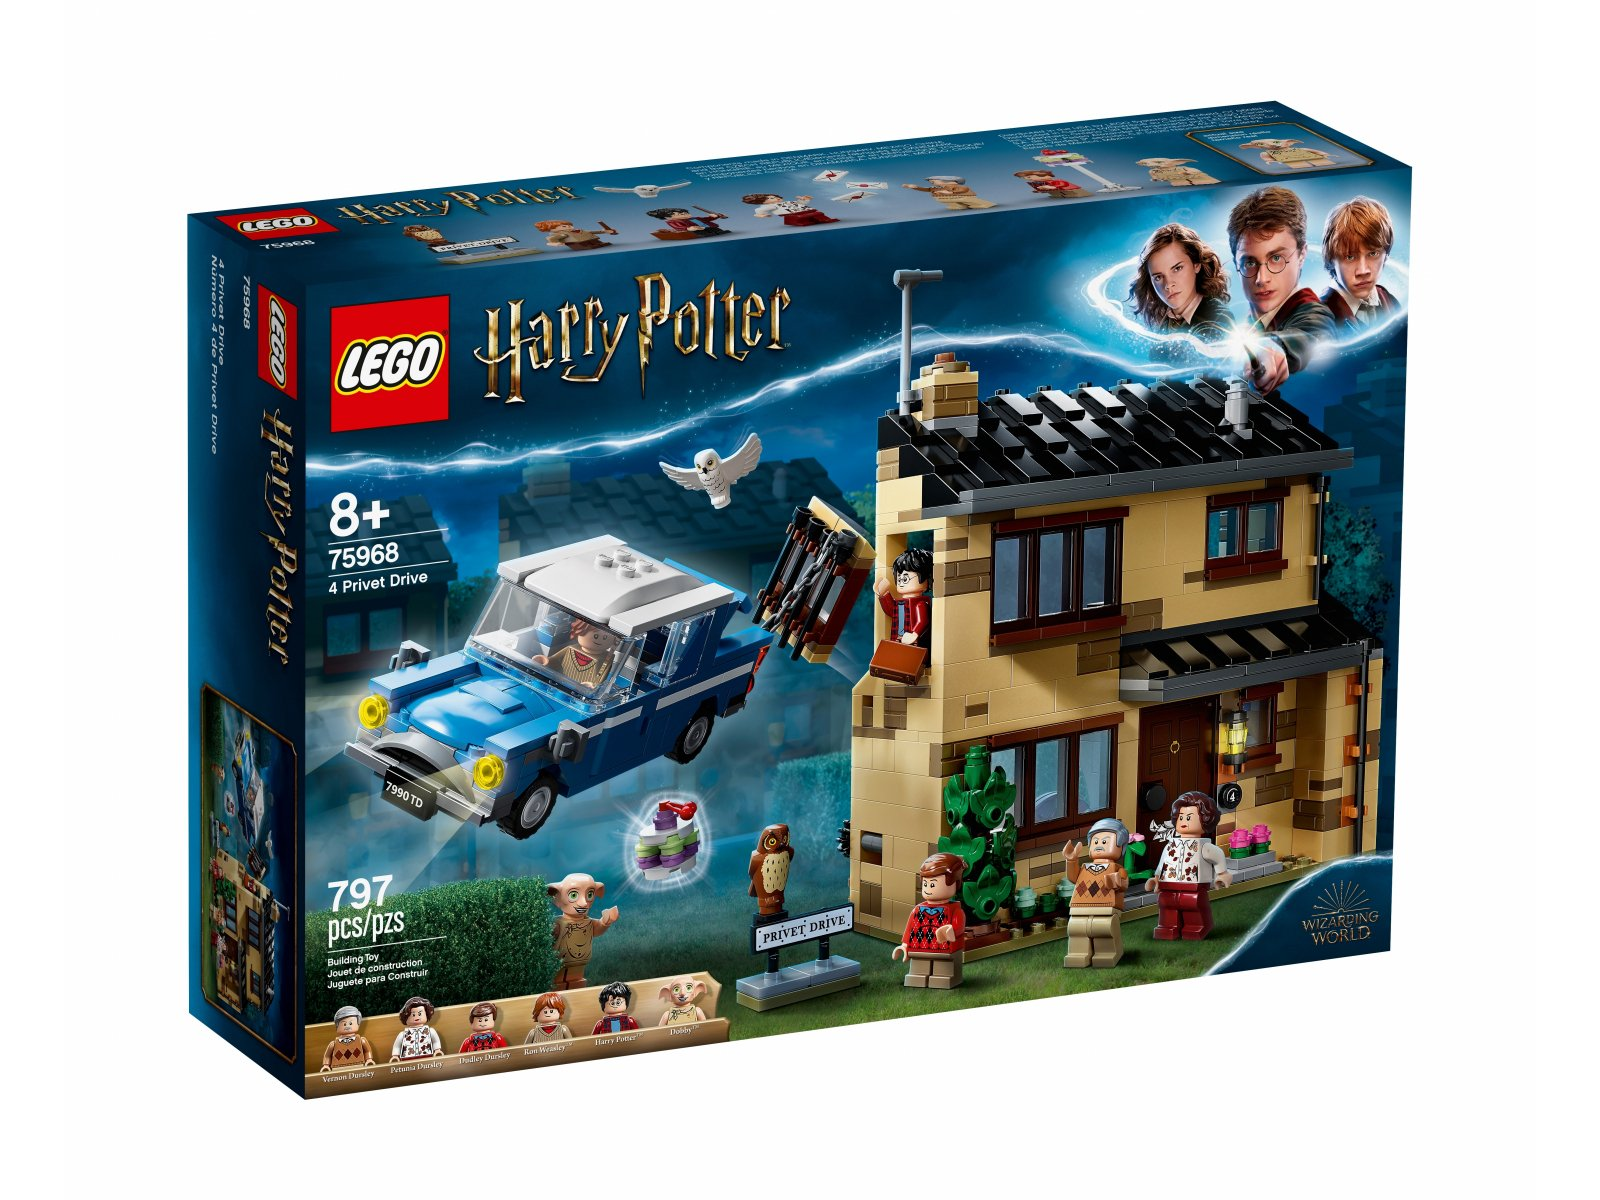 LEGO 75968 Harry Potter™ Privet Drive 4